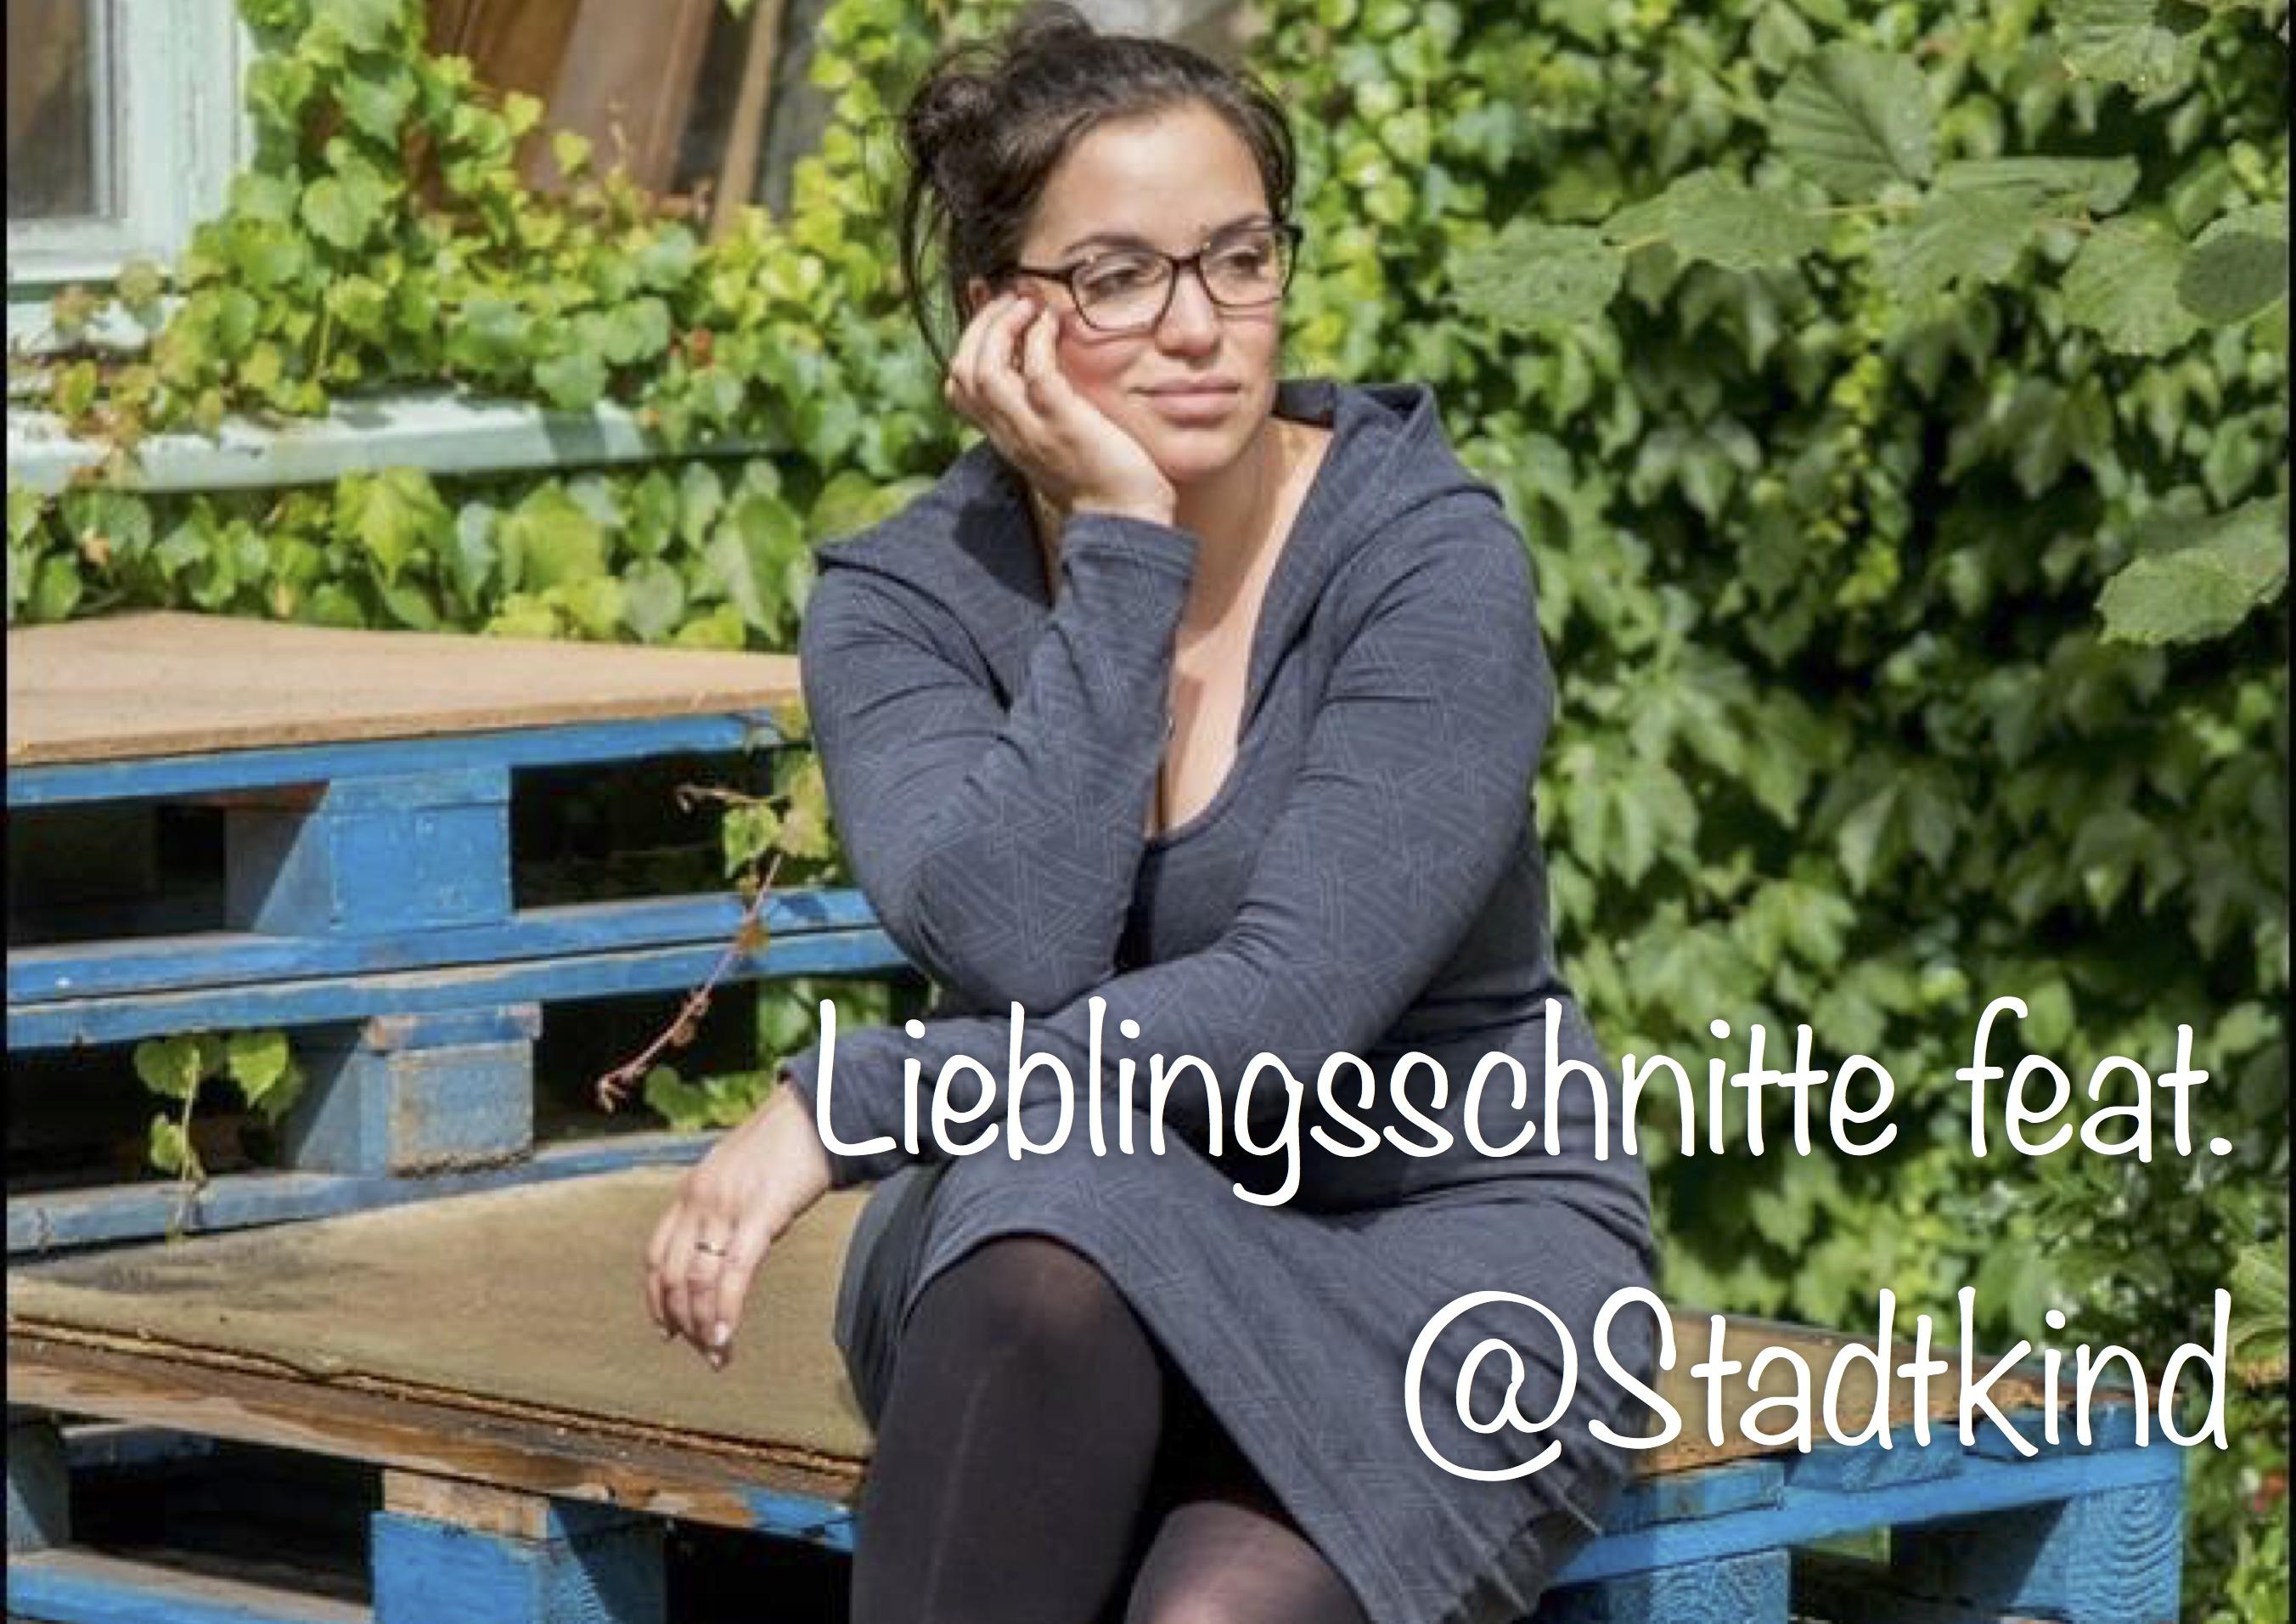 Lieblingsschnitte feat. @Stadtkind